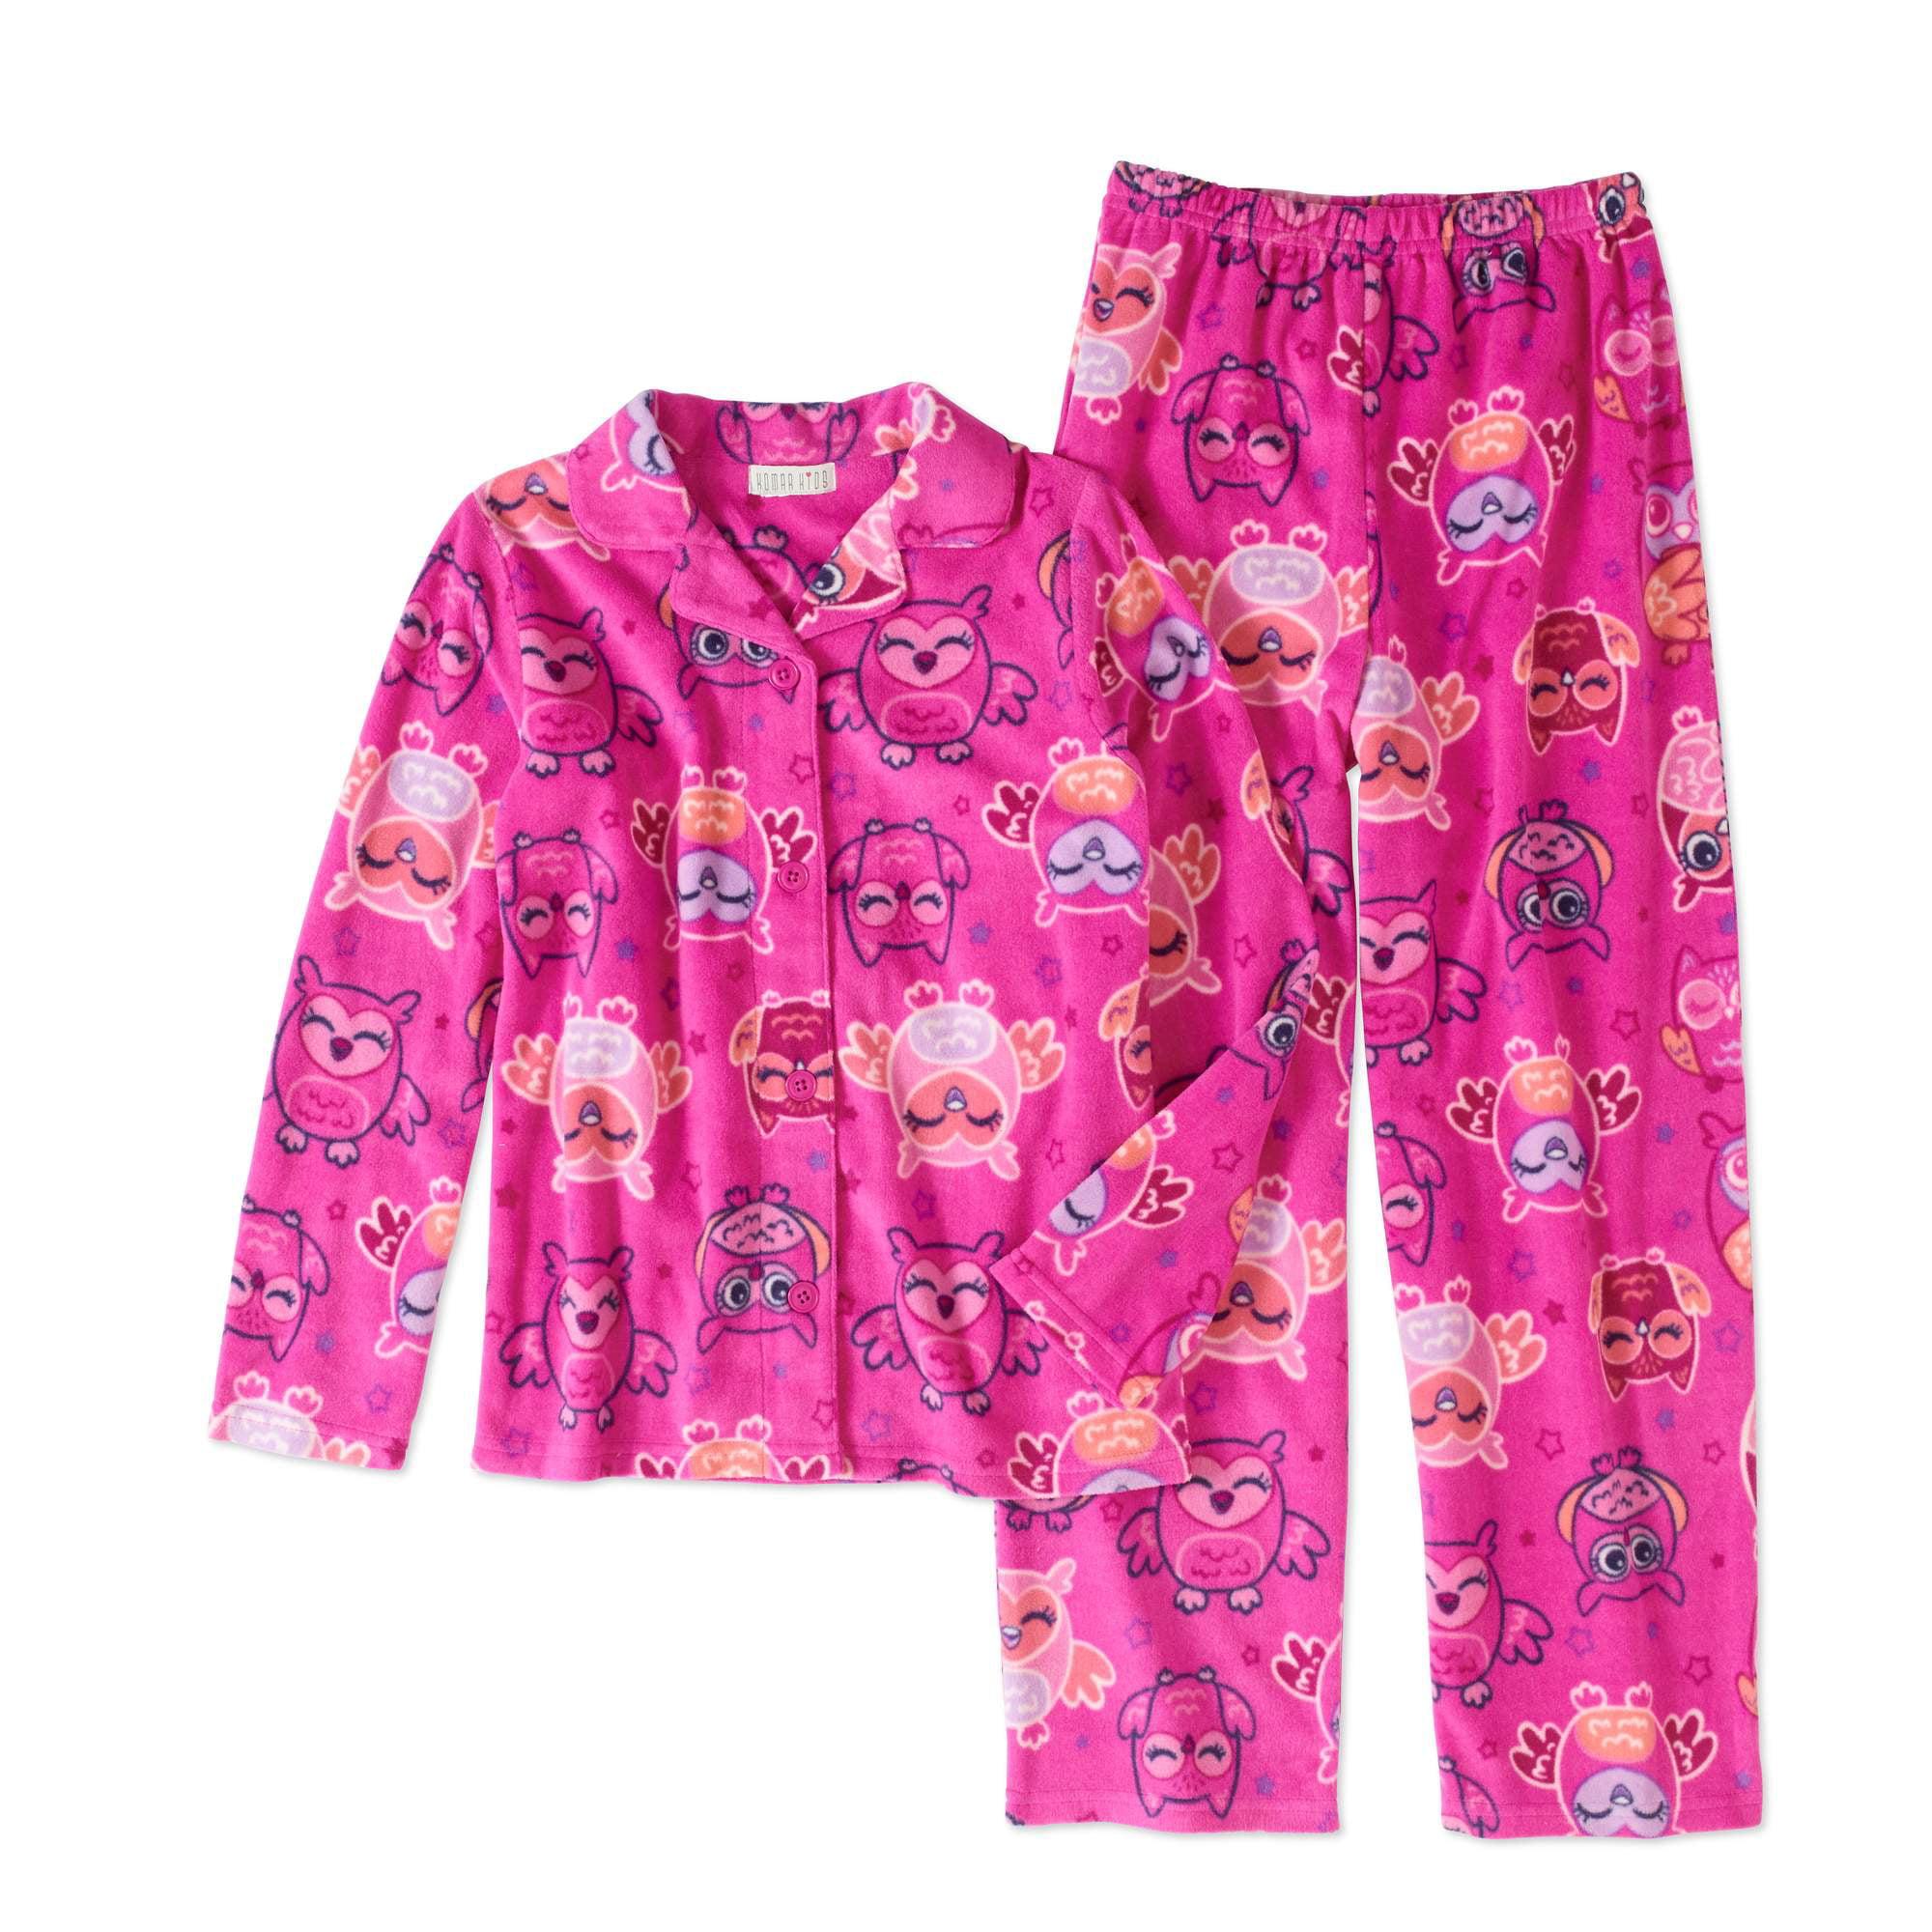 Komar Kids Girls' Owl Fleece 2pc Button Front Pajama